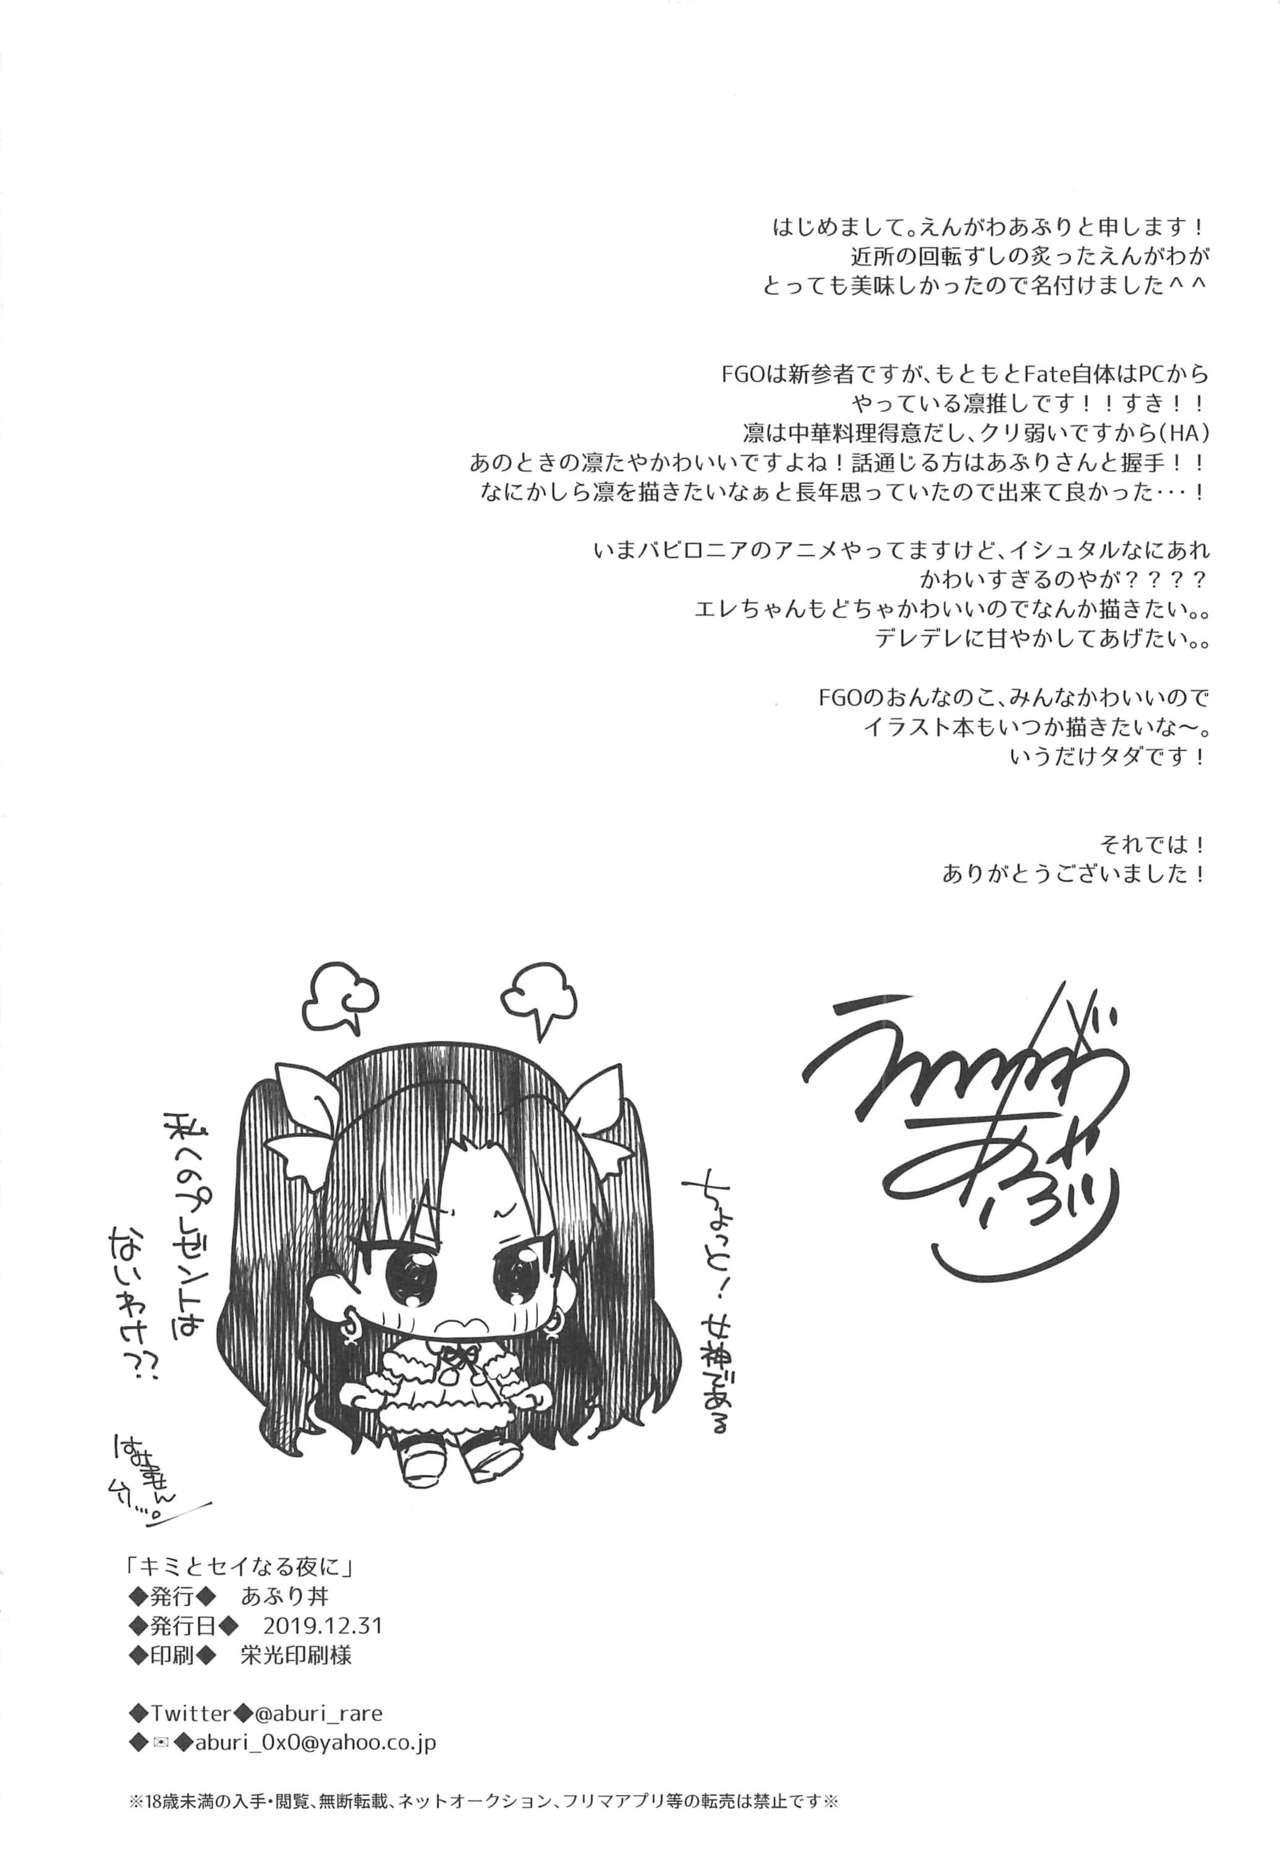 Kimi to Seinaru Yoru ni | On this holy night with you 20